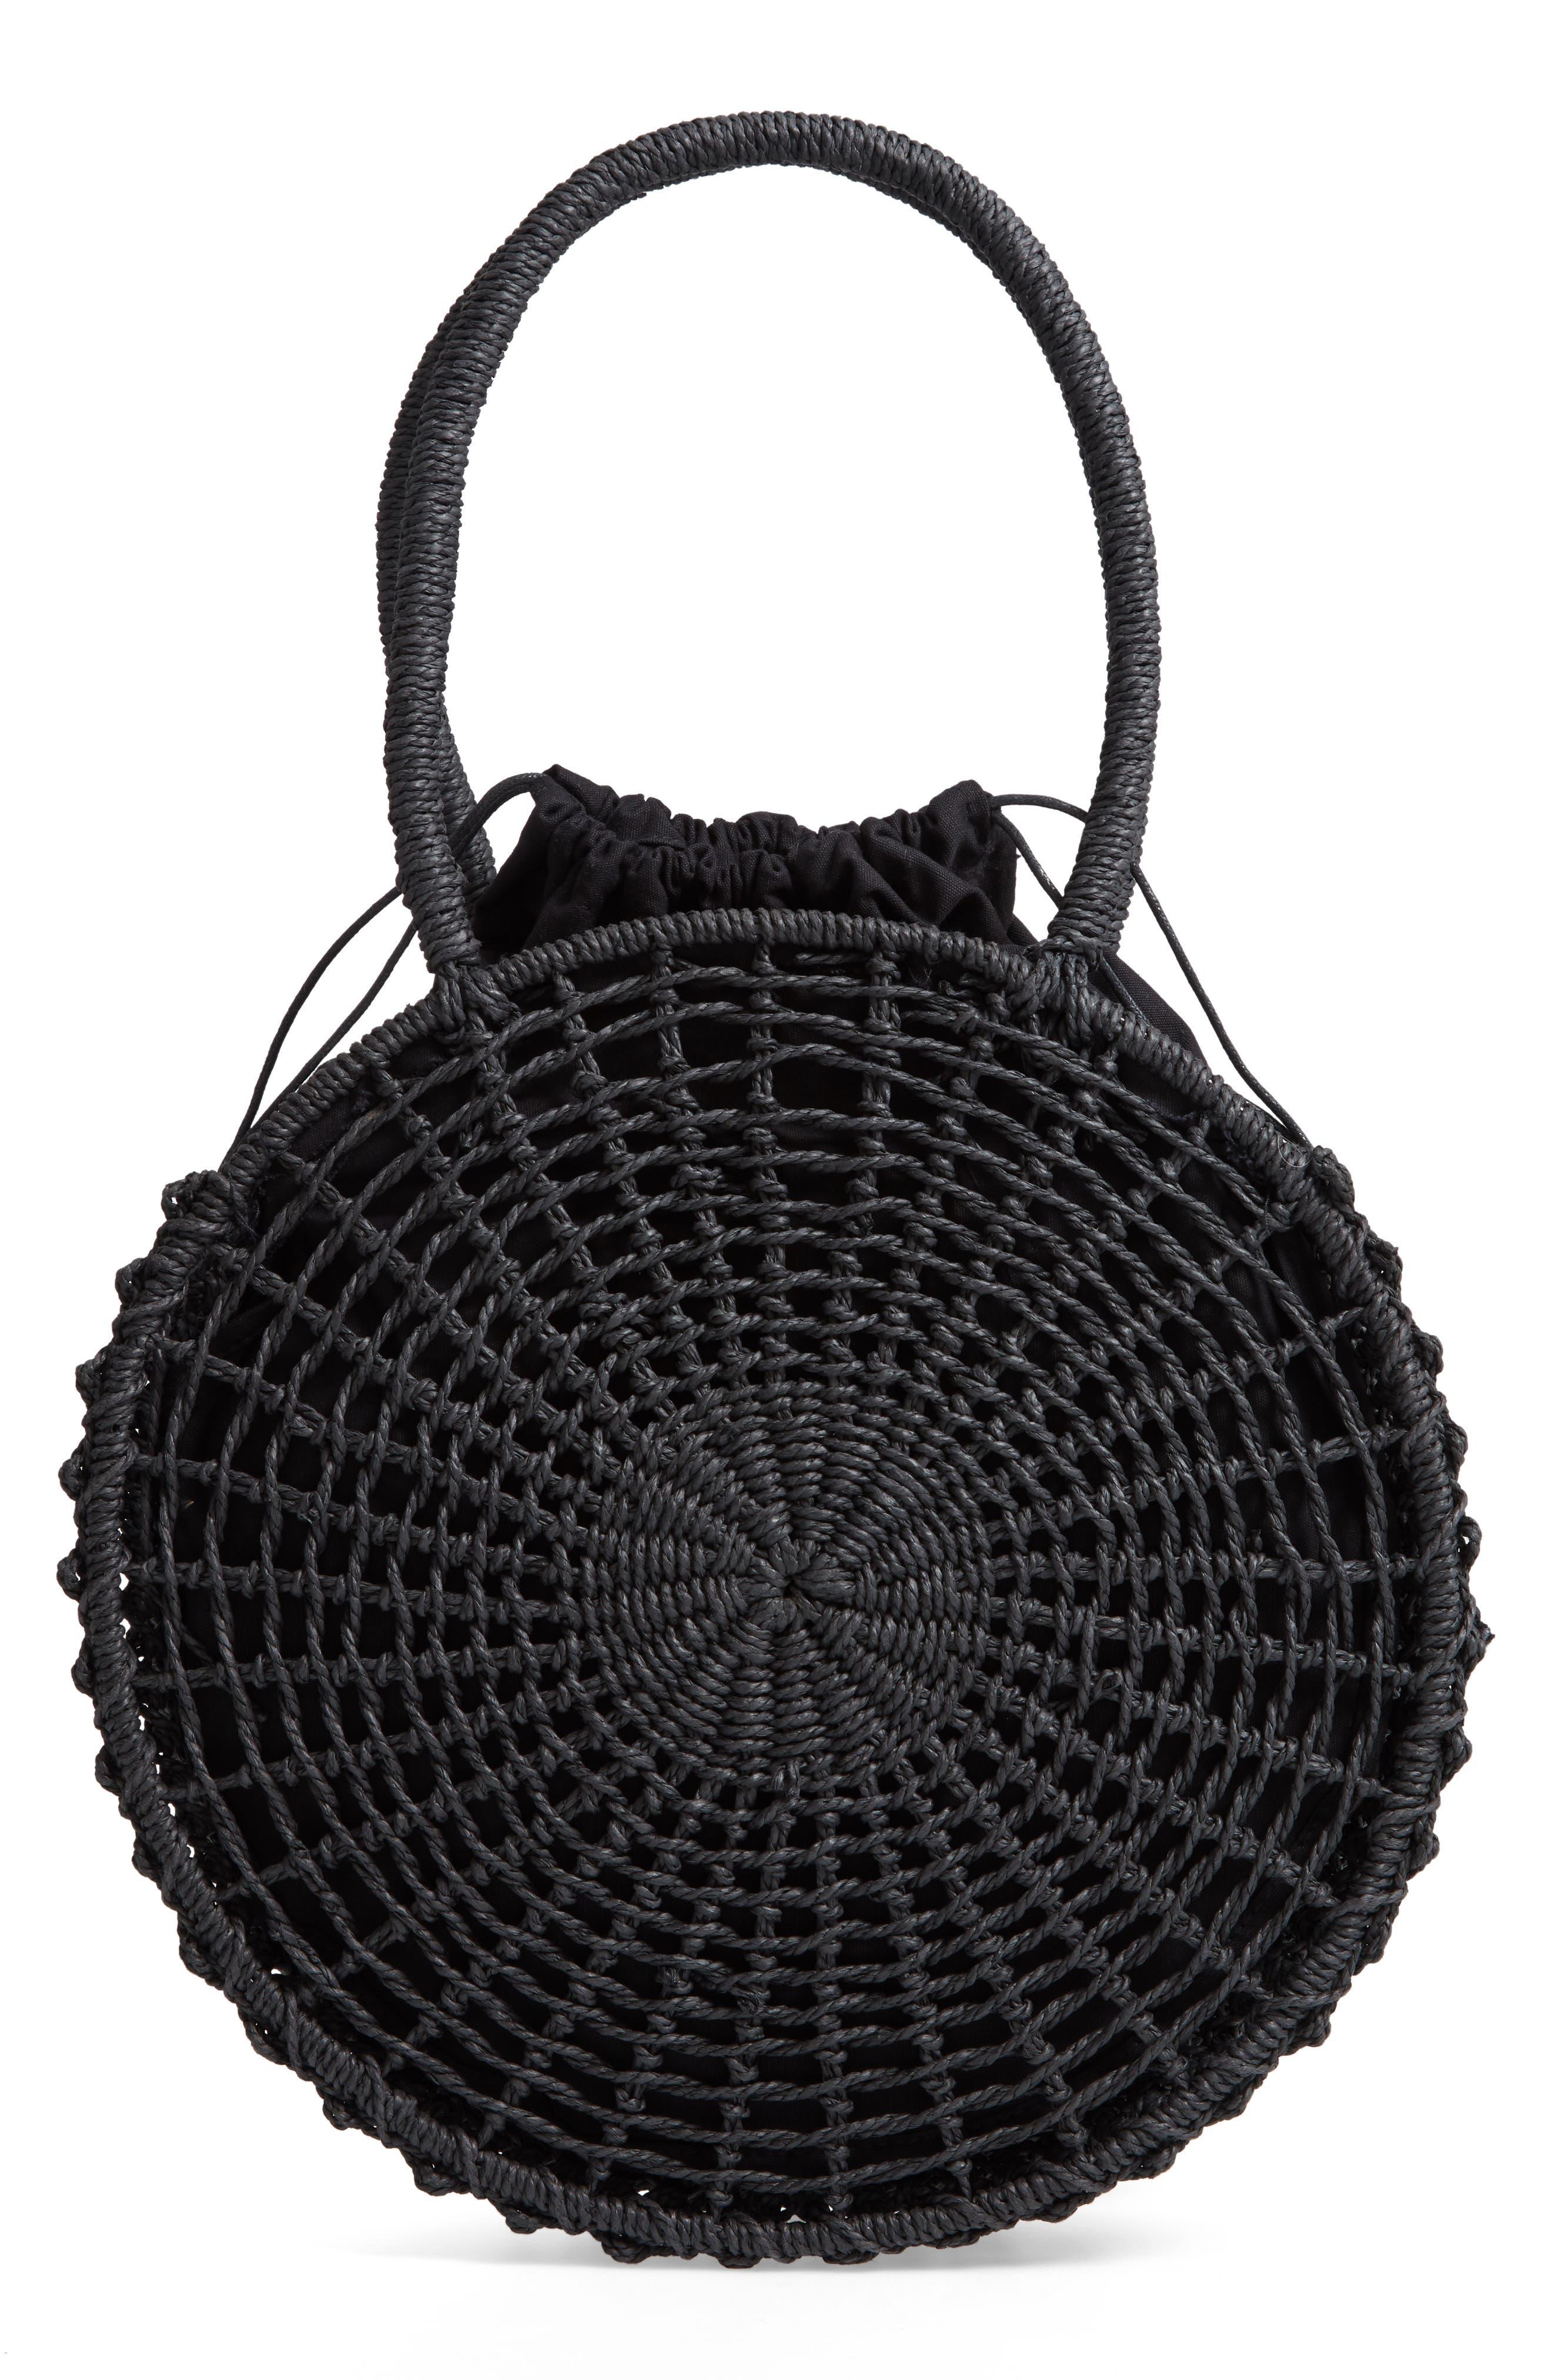 Bella Straw Circle Tote Handbag,                         Main,                         color, BLACK